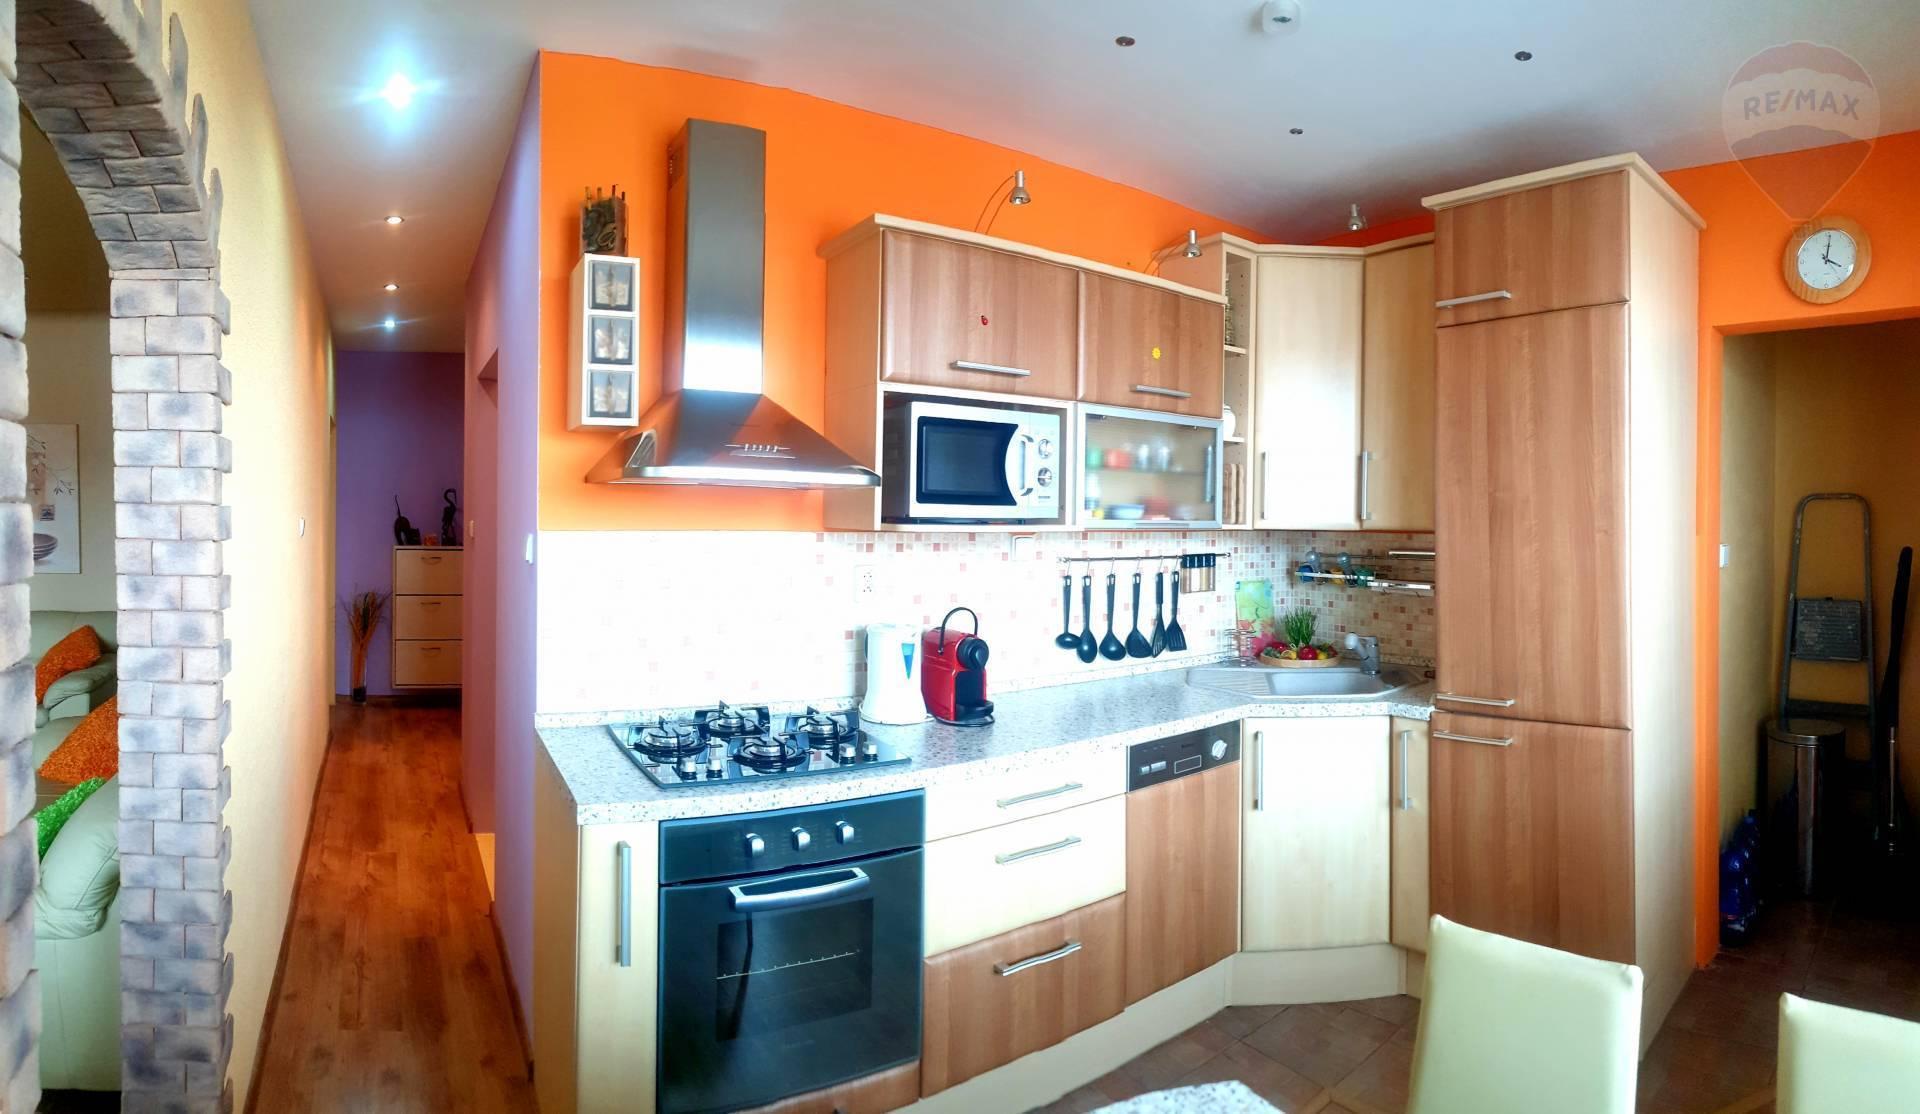 Predám 2 izbový byt, Bošany, balkón, komplet rekonštrukcia